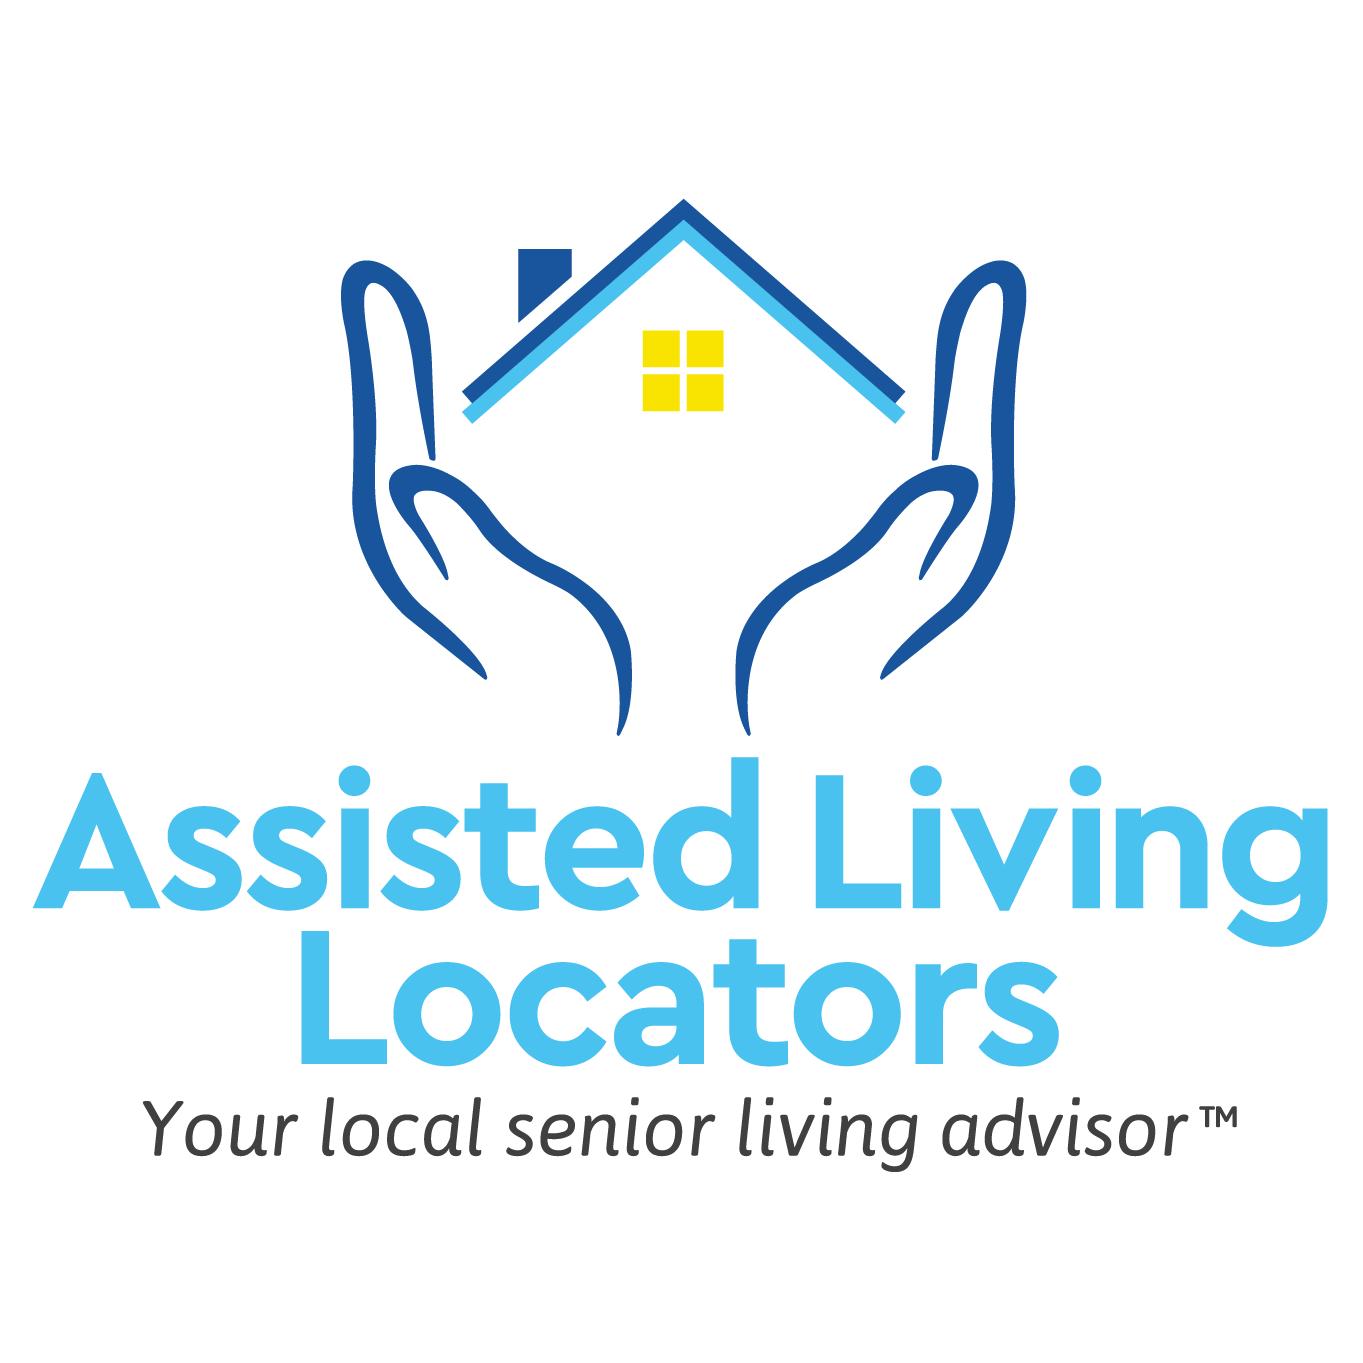 Assisted Living Locators Of Orange County - Newport Beach, CA 92660 - (949)675-5475 | ShowMeLocal.com